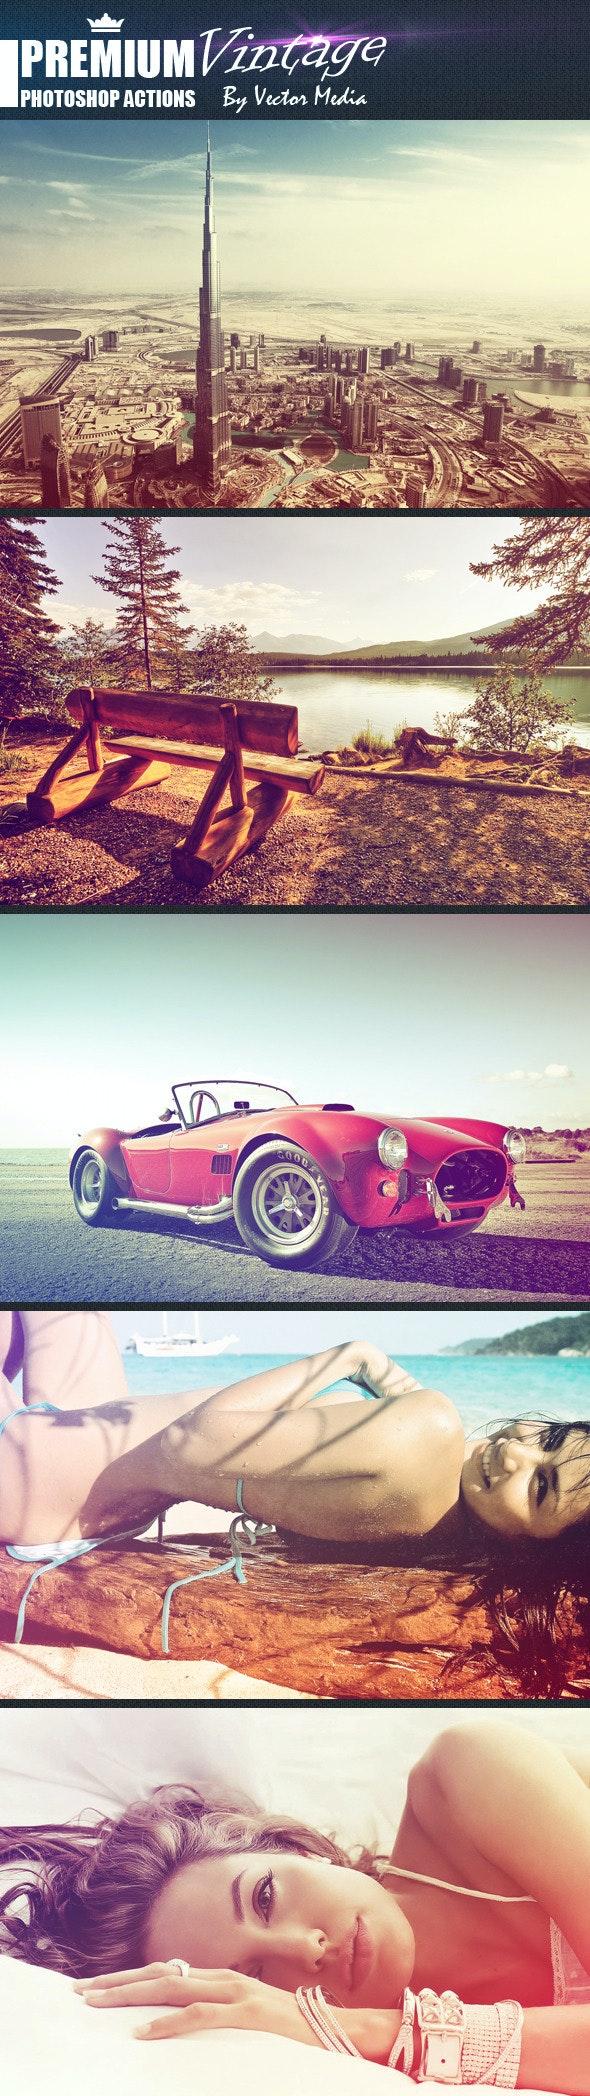 Premium Vintage - Photoshop Actions - Photo Effects Actions